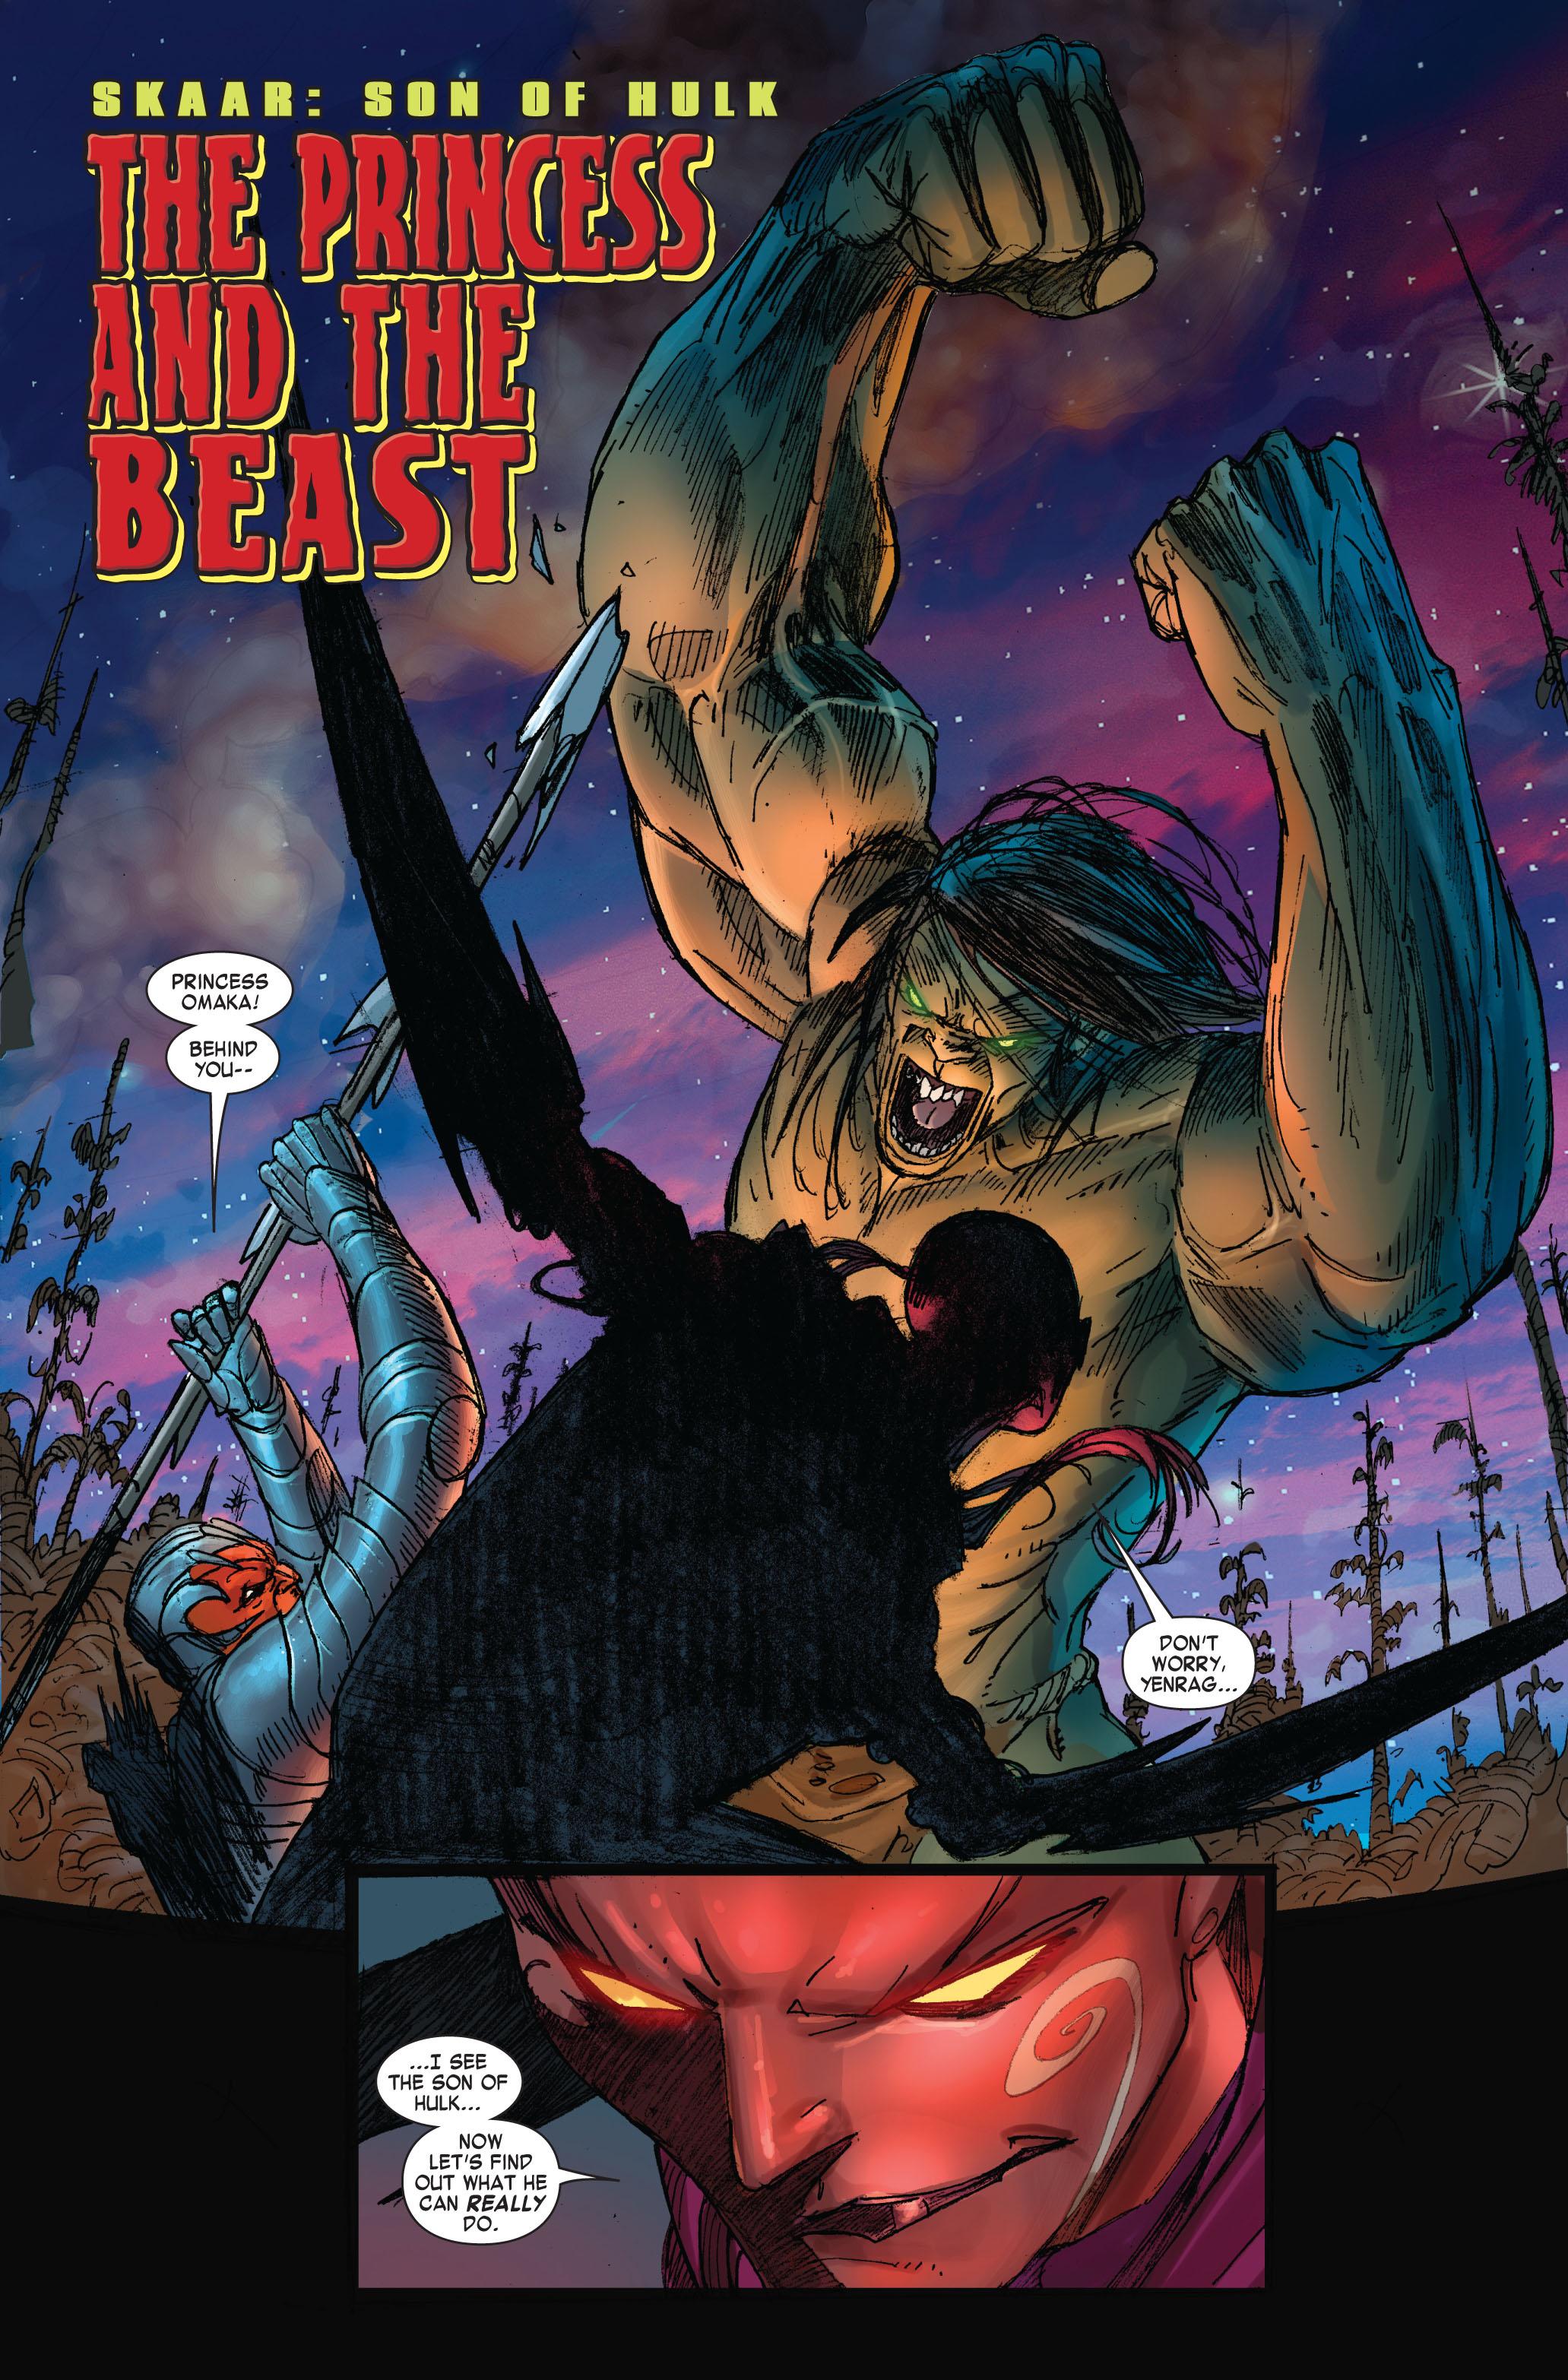 Read online Skaar: Son of Hulk comic -  Issue #3 - 3